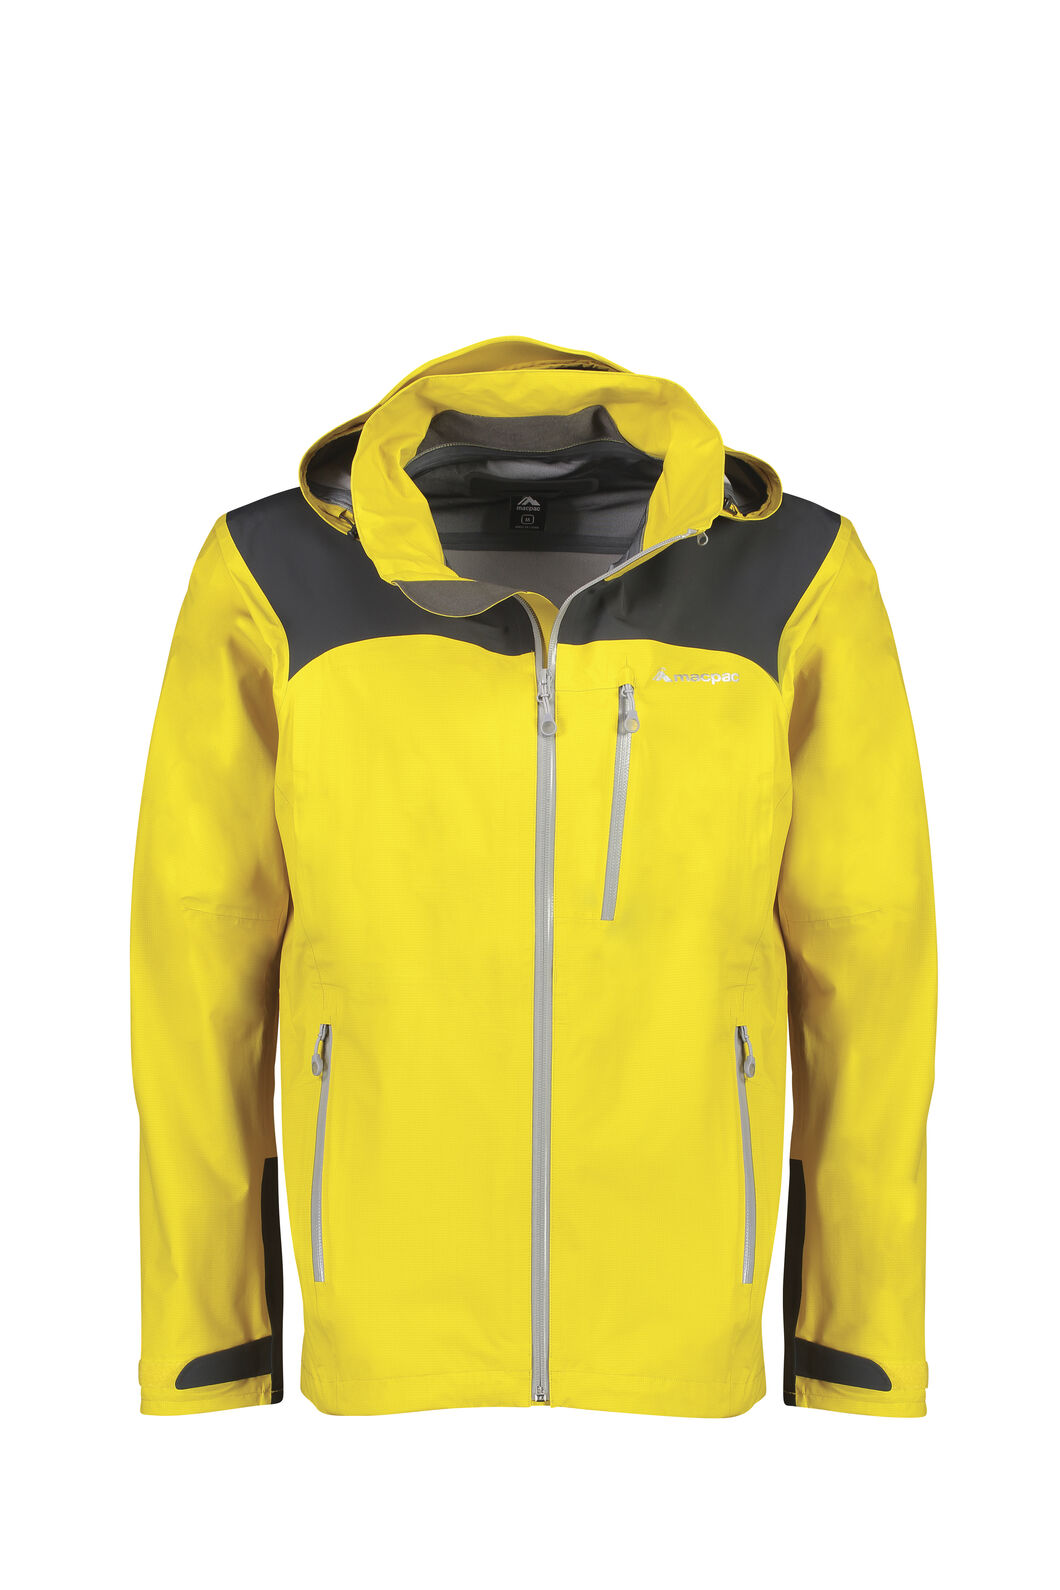 Macpac Traverse Pertex® Rain Jacket - Men's, Lemon Curry, hi-res